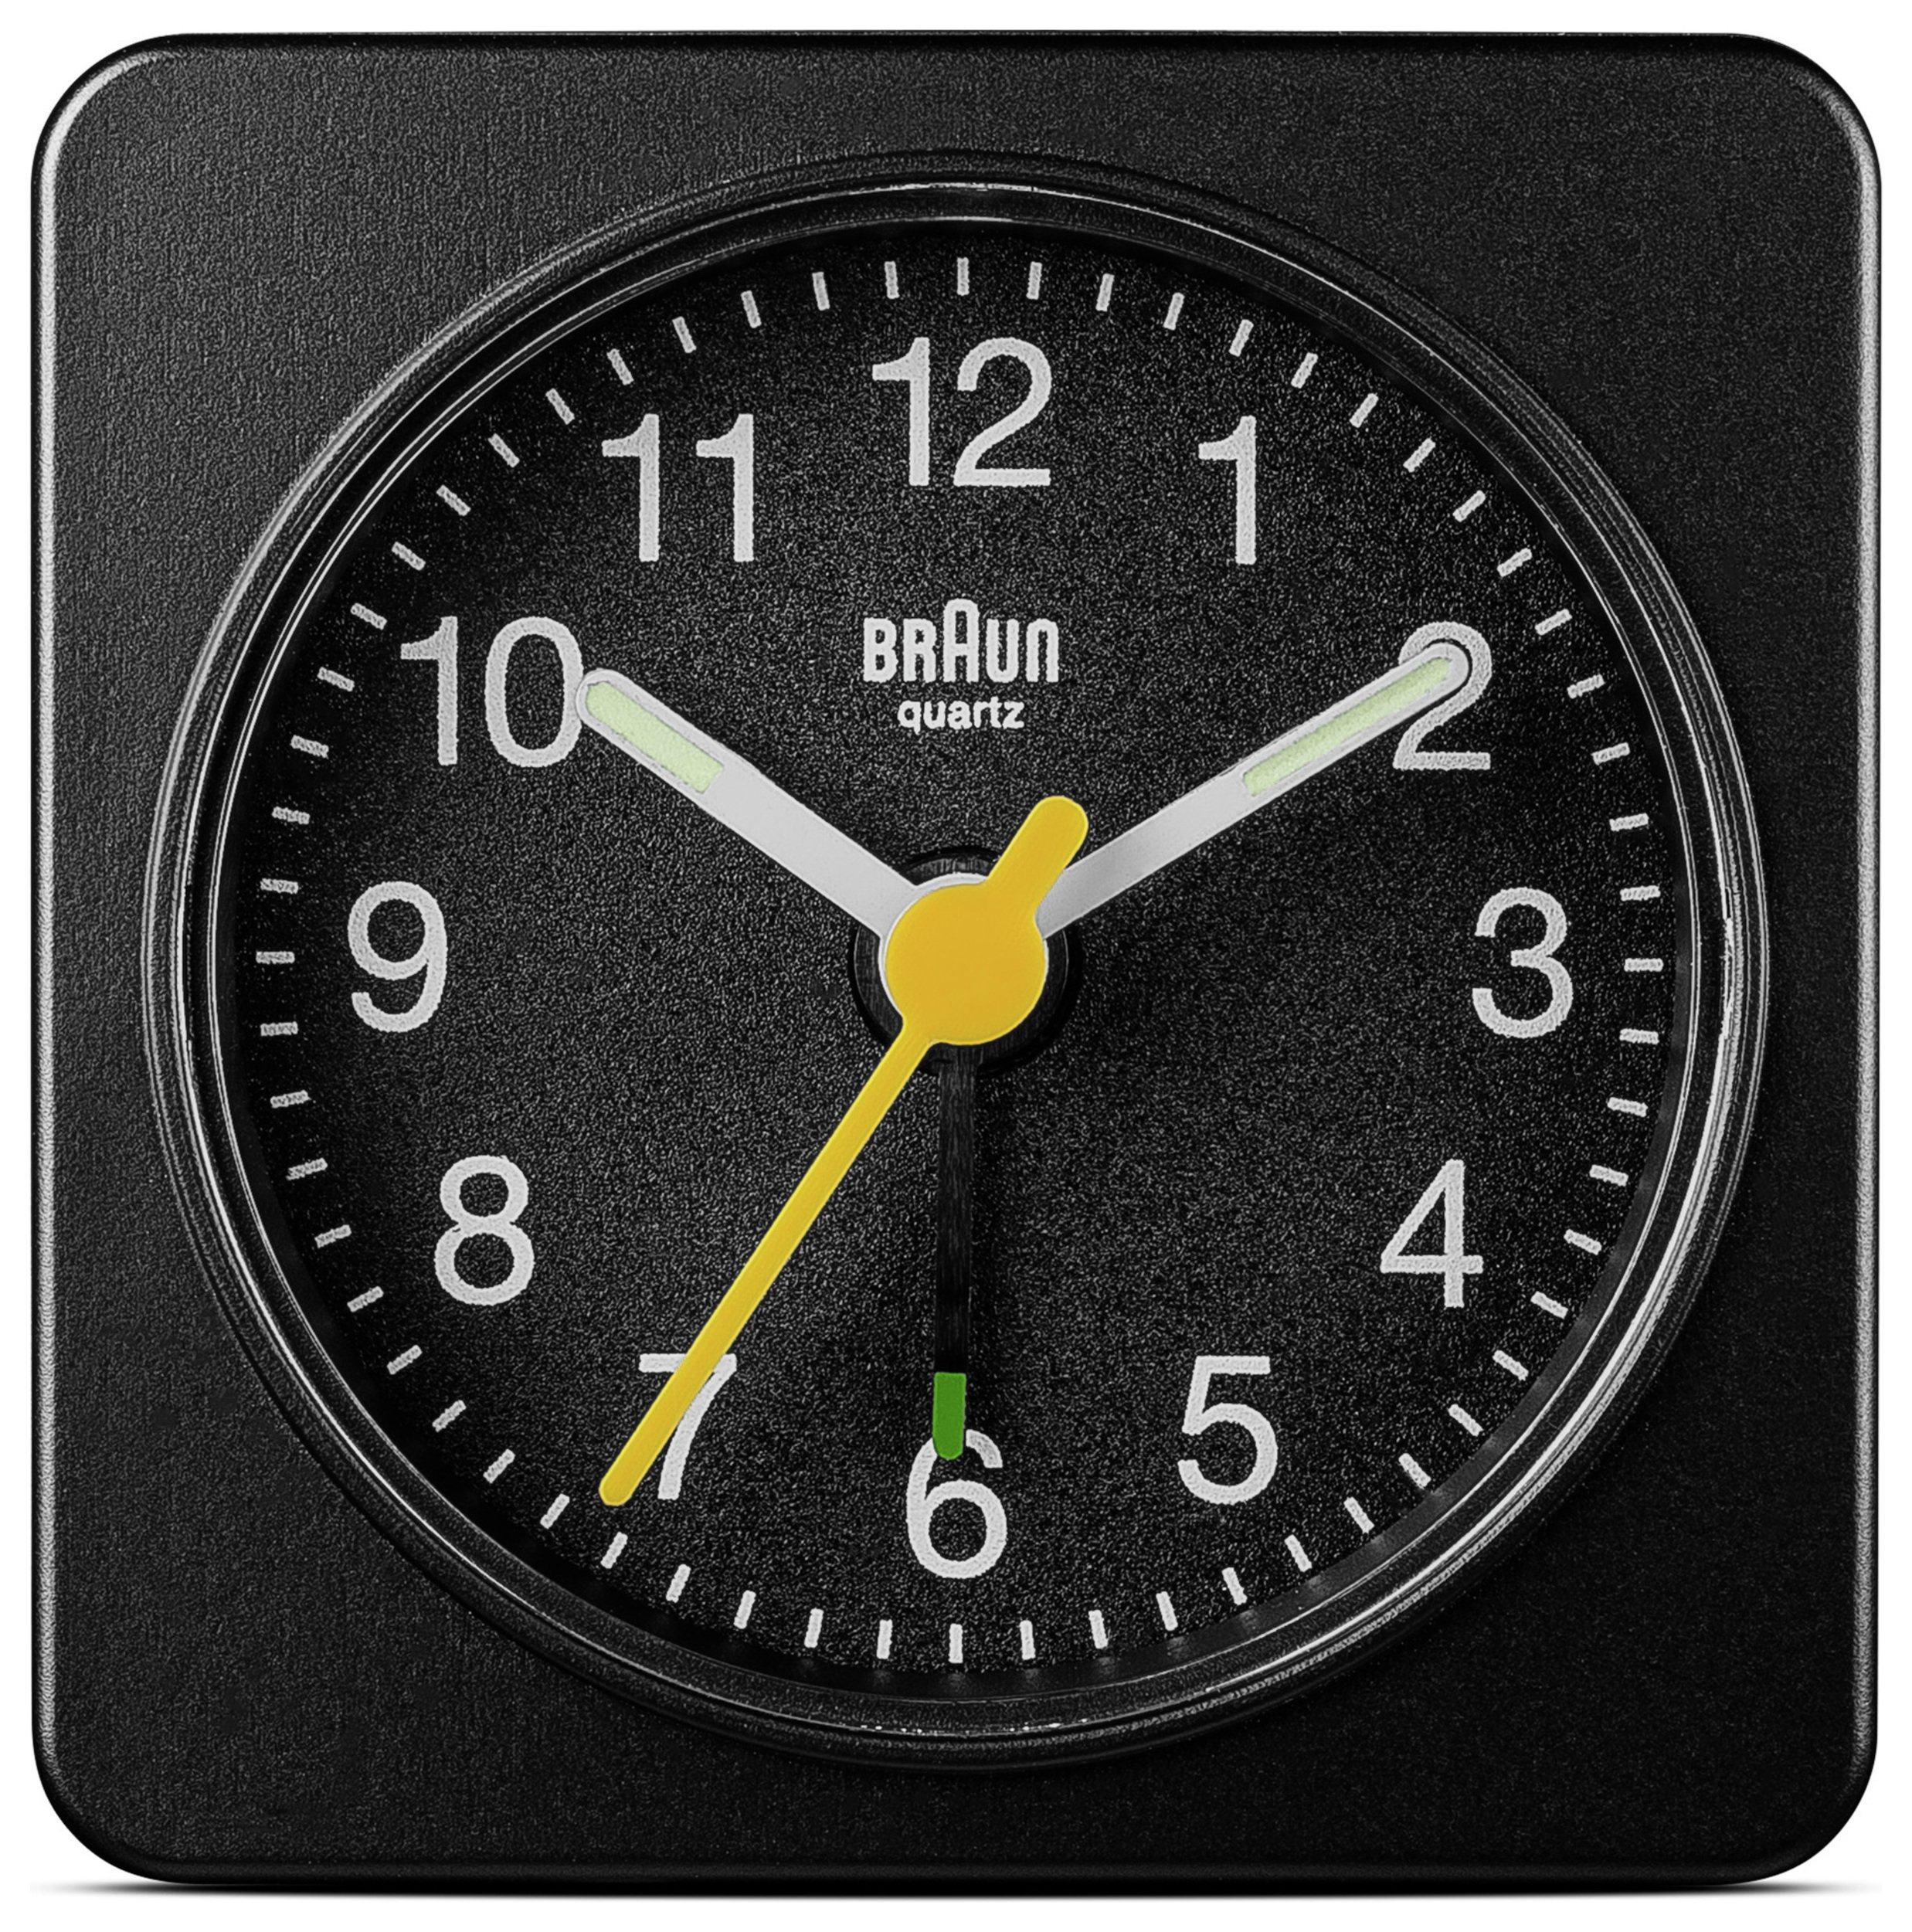 Image of Braun Travel Alarm Clock - Black